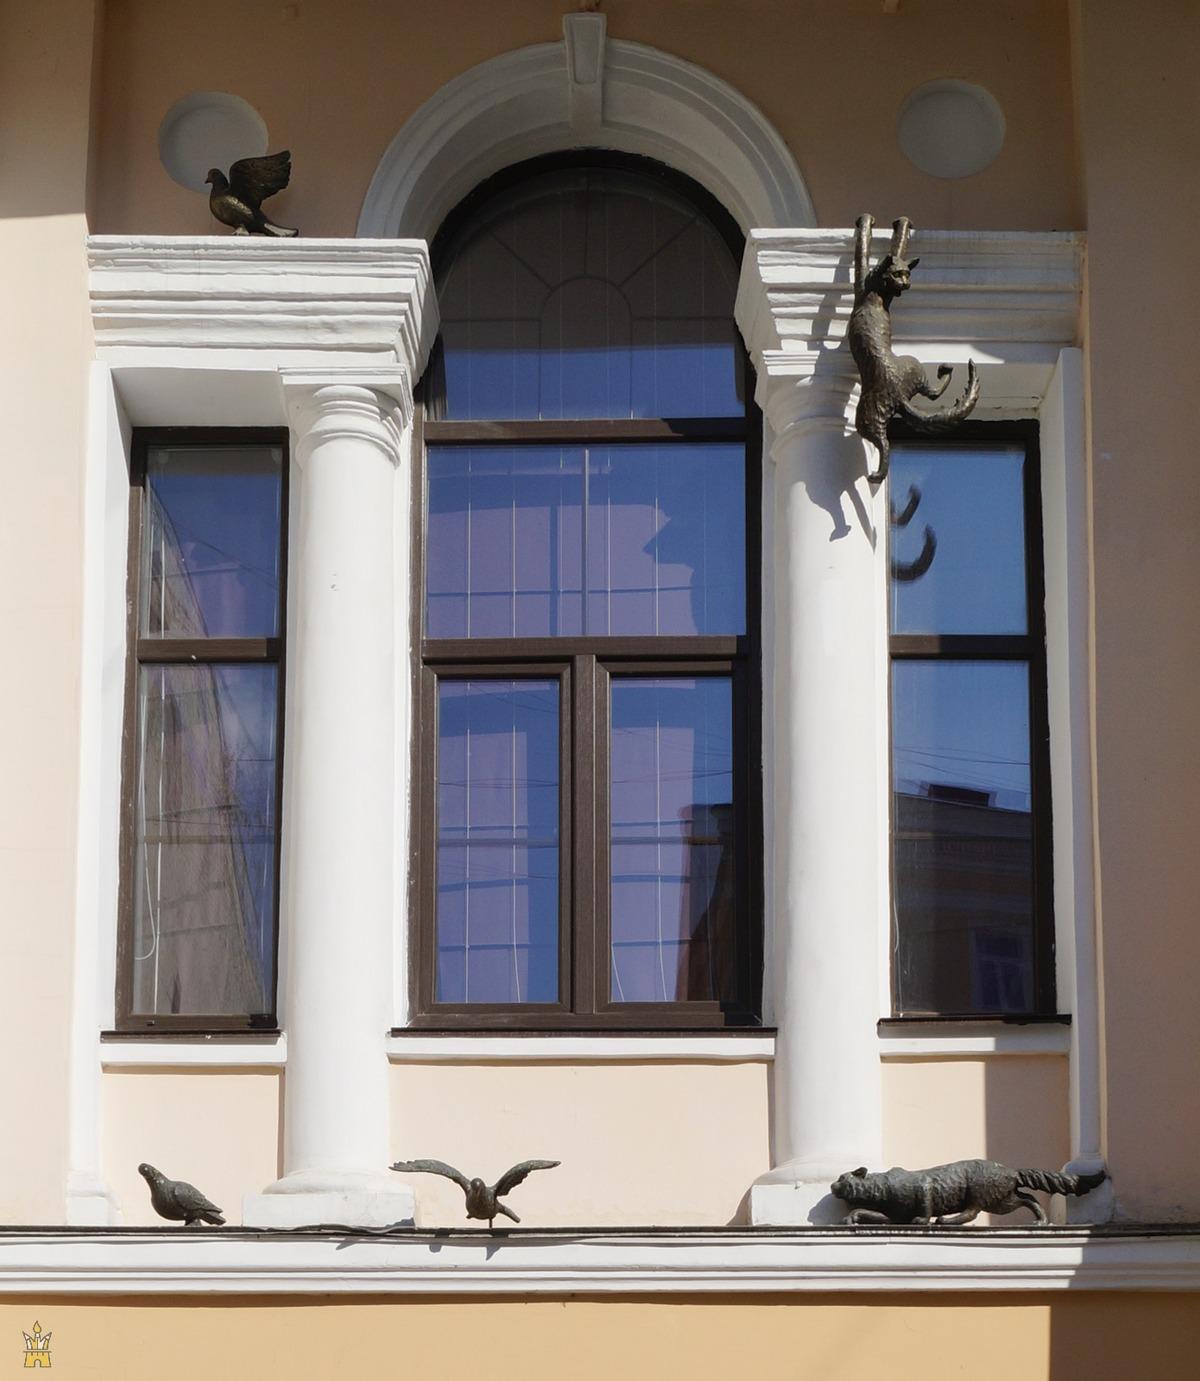 Особняк Костромина на Покровке. Детали фасада: кошки охотятся за птицами